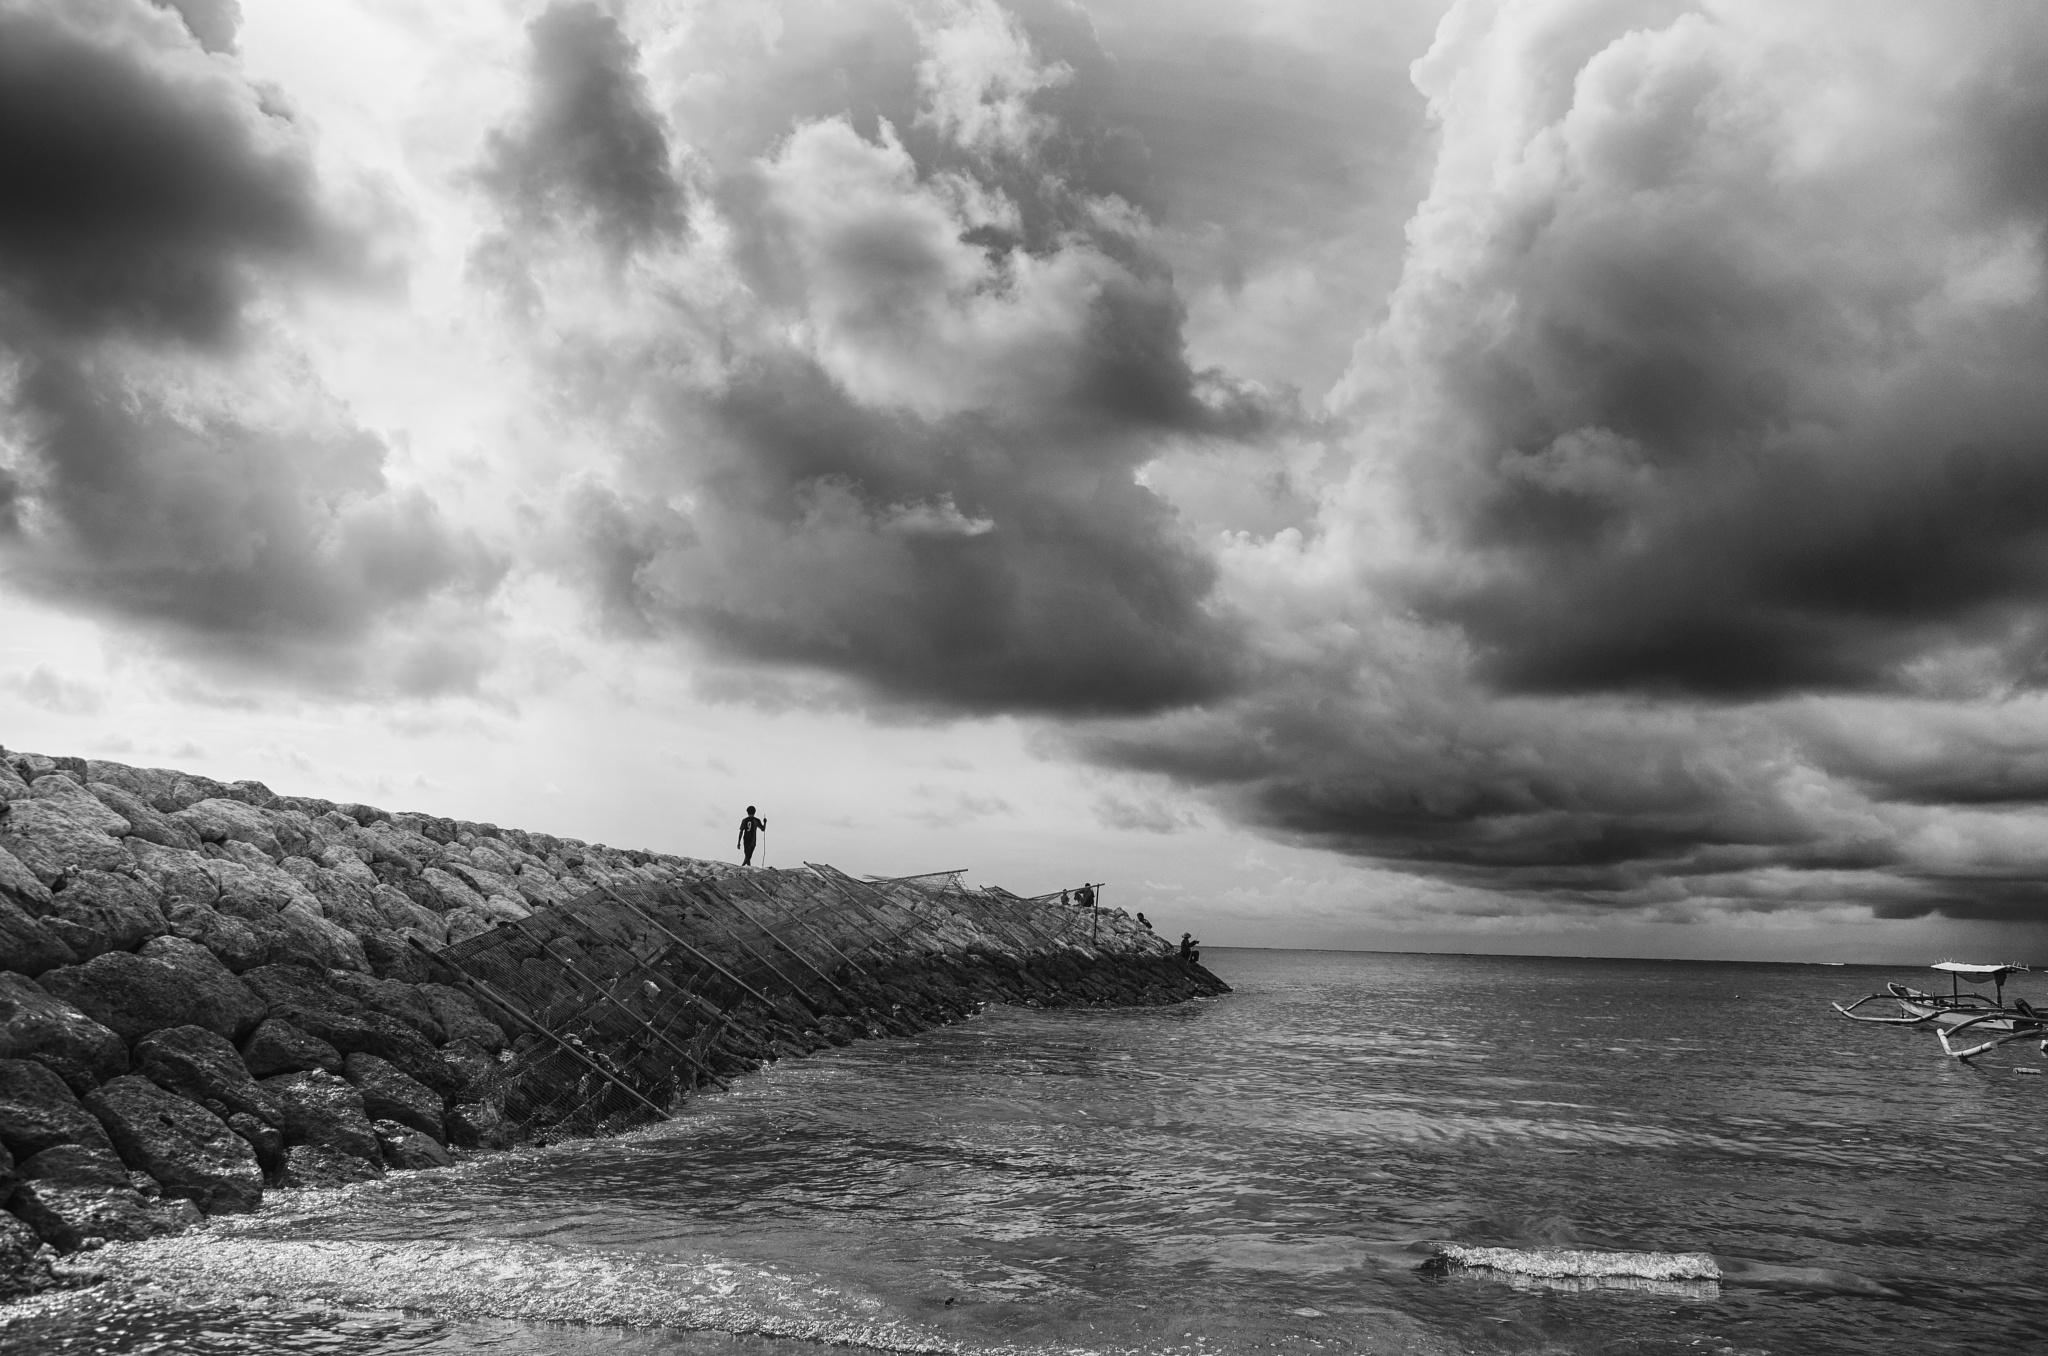 cloudy day over Kuta beach, Bali by nurdinrivai